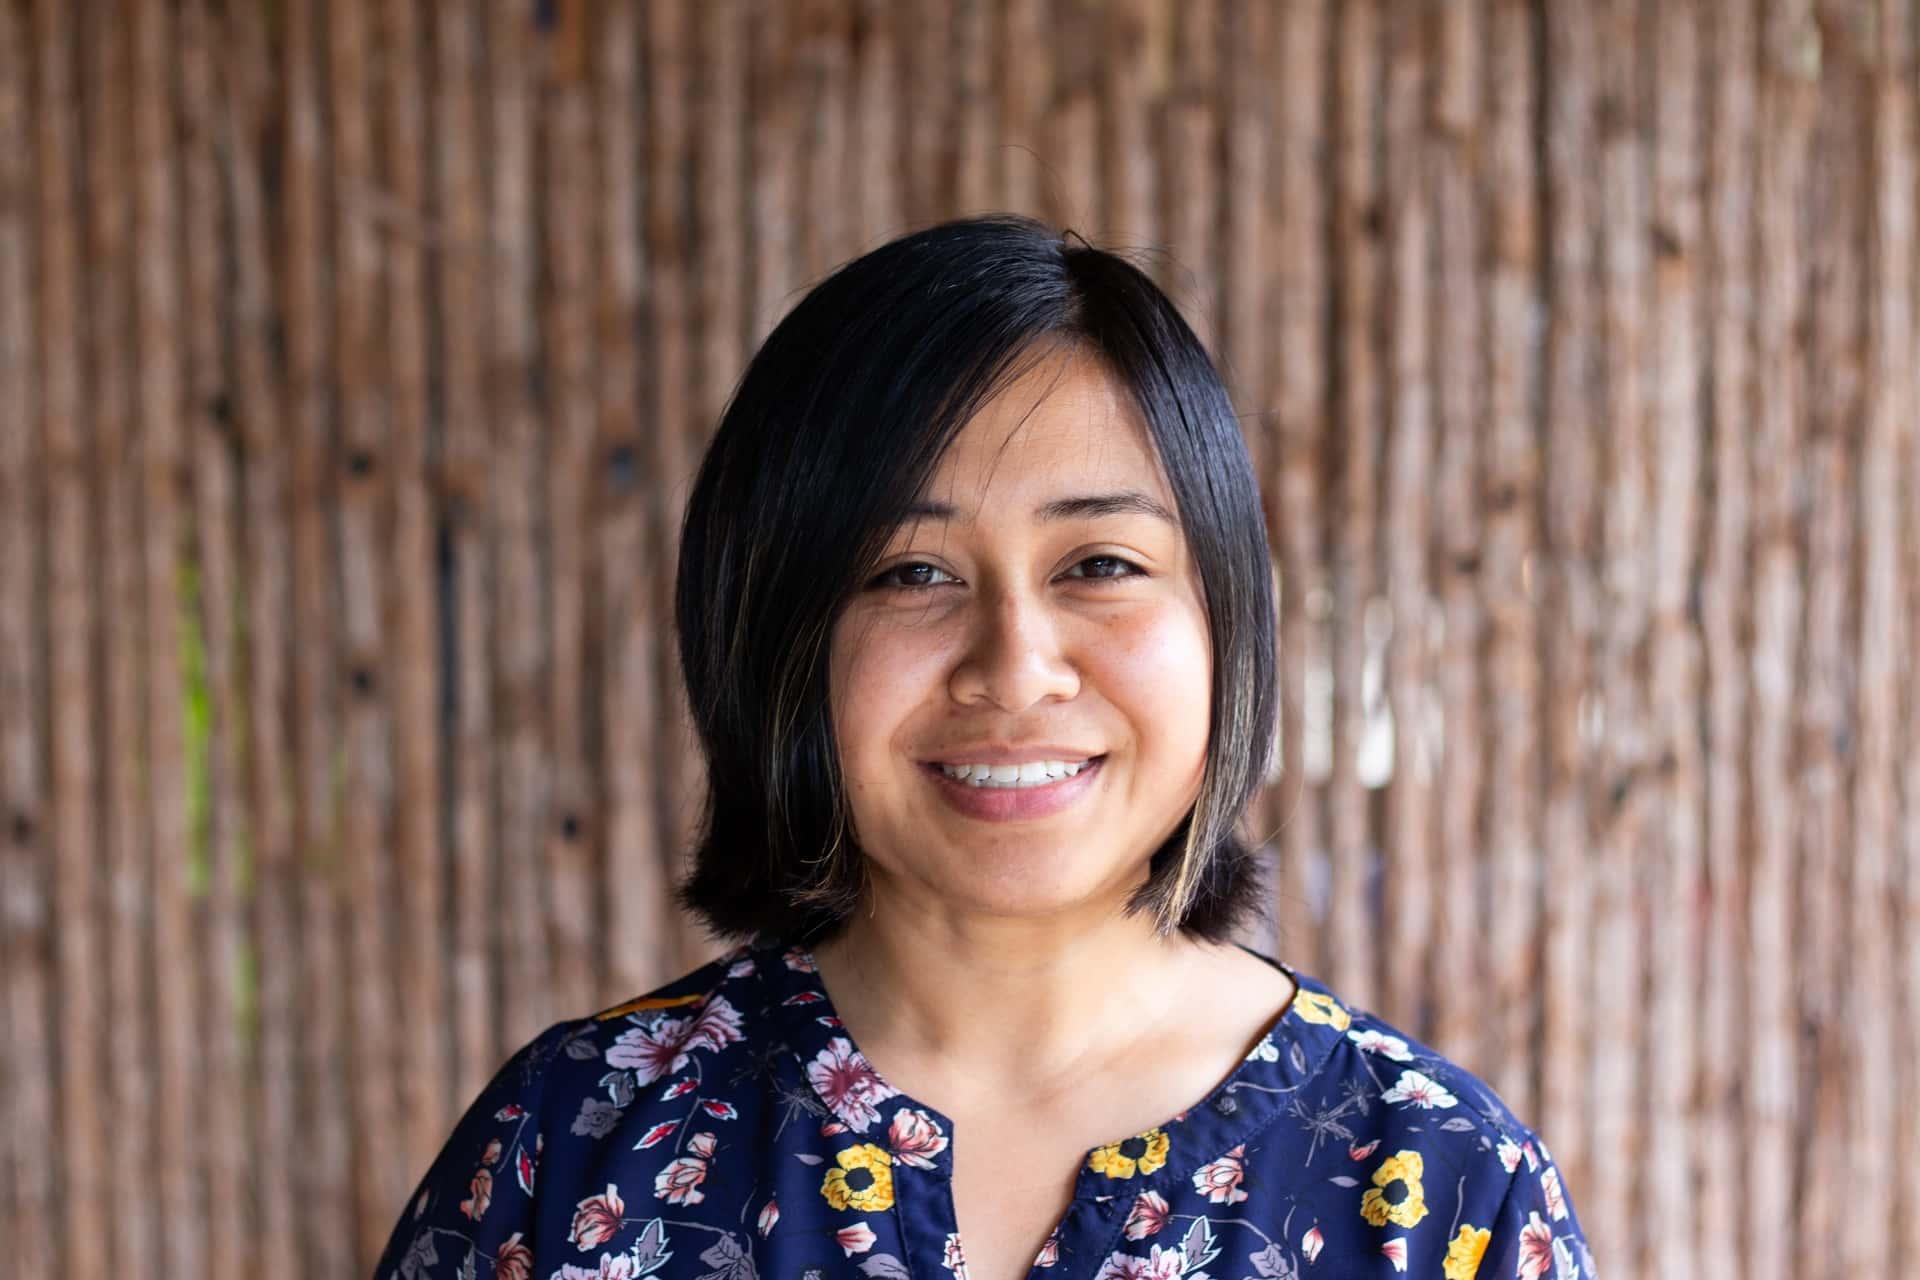 Marielle Ibarra